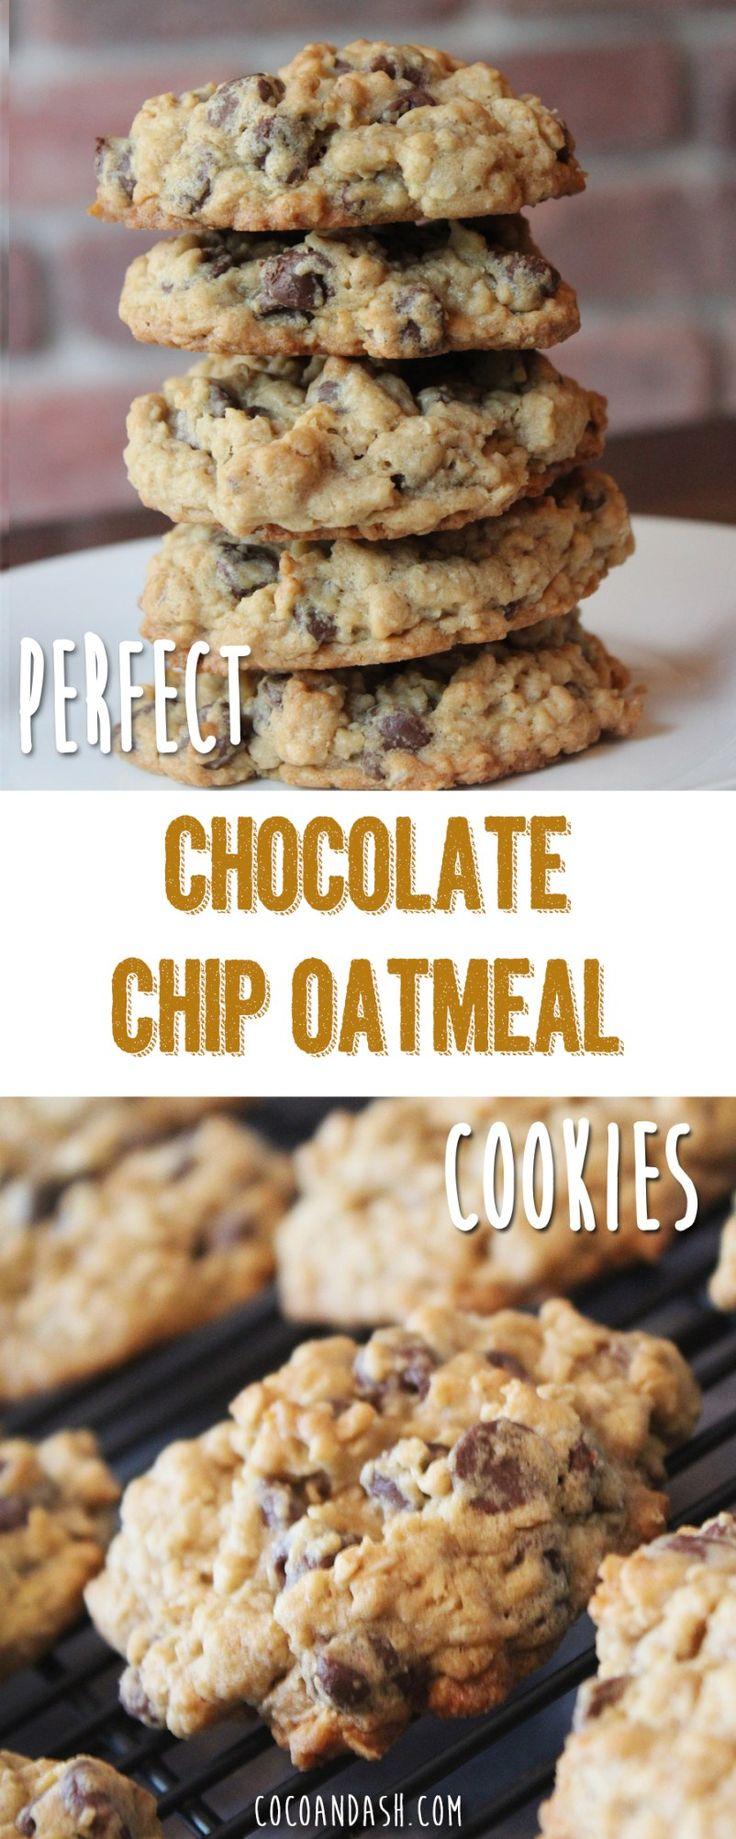 Best 25+ Best chocolate chip cookie ideas on Pinterest | Chocolate ...